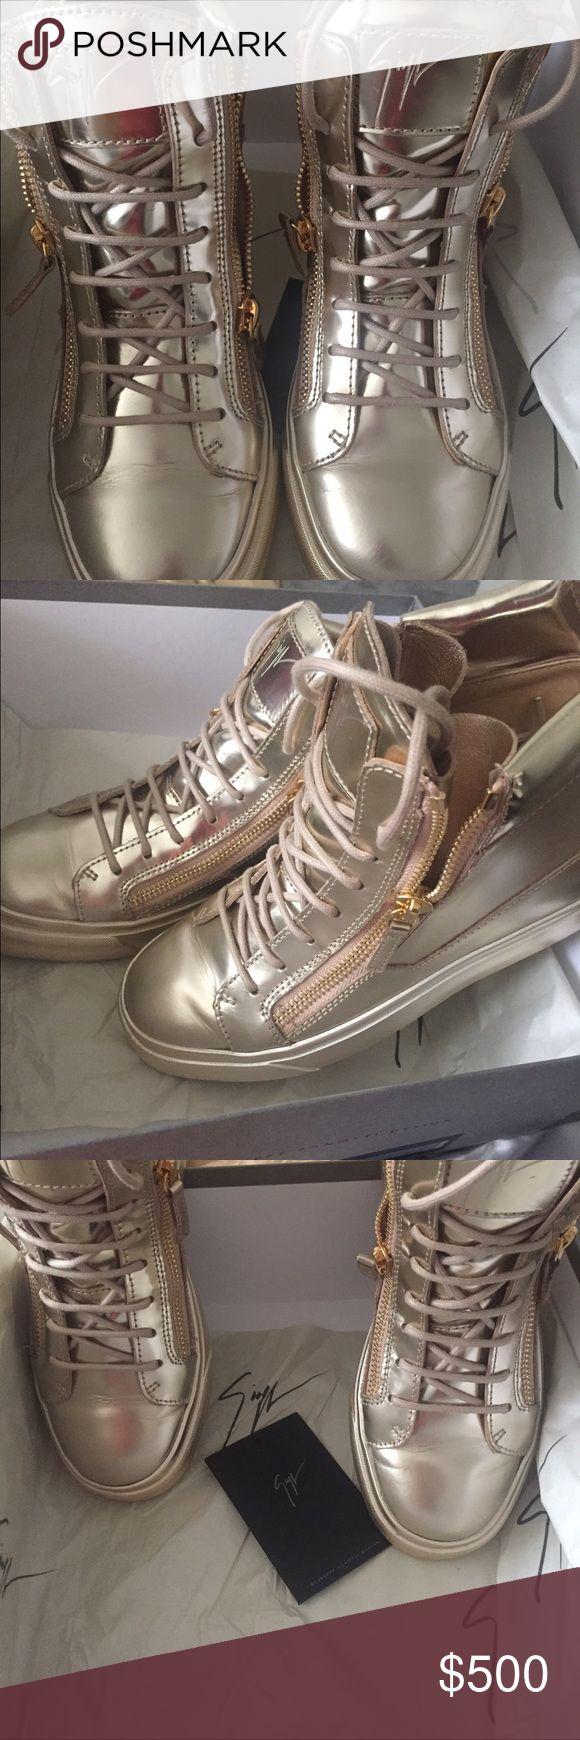 Giuseppe Zanotti Womens Metallic Gold Sneakers 38 Authentic Womens Giuseppe sneakers size 38        Original Box and Tags! Giuseppe Zanotti Shoes Sneakers